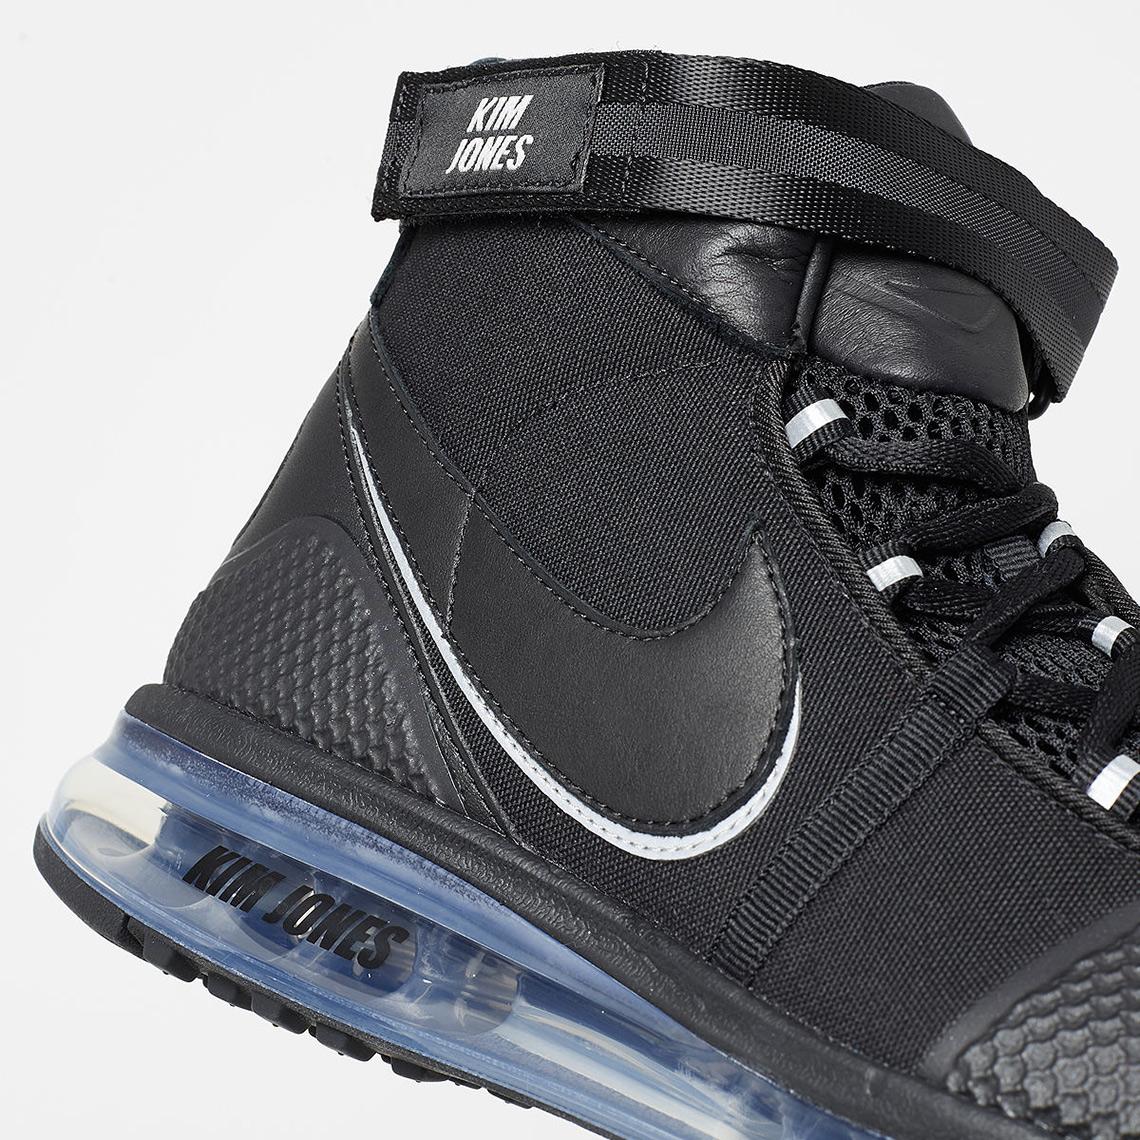 giày thể thao - ELLE Man i87